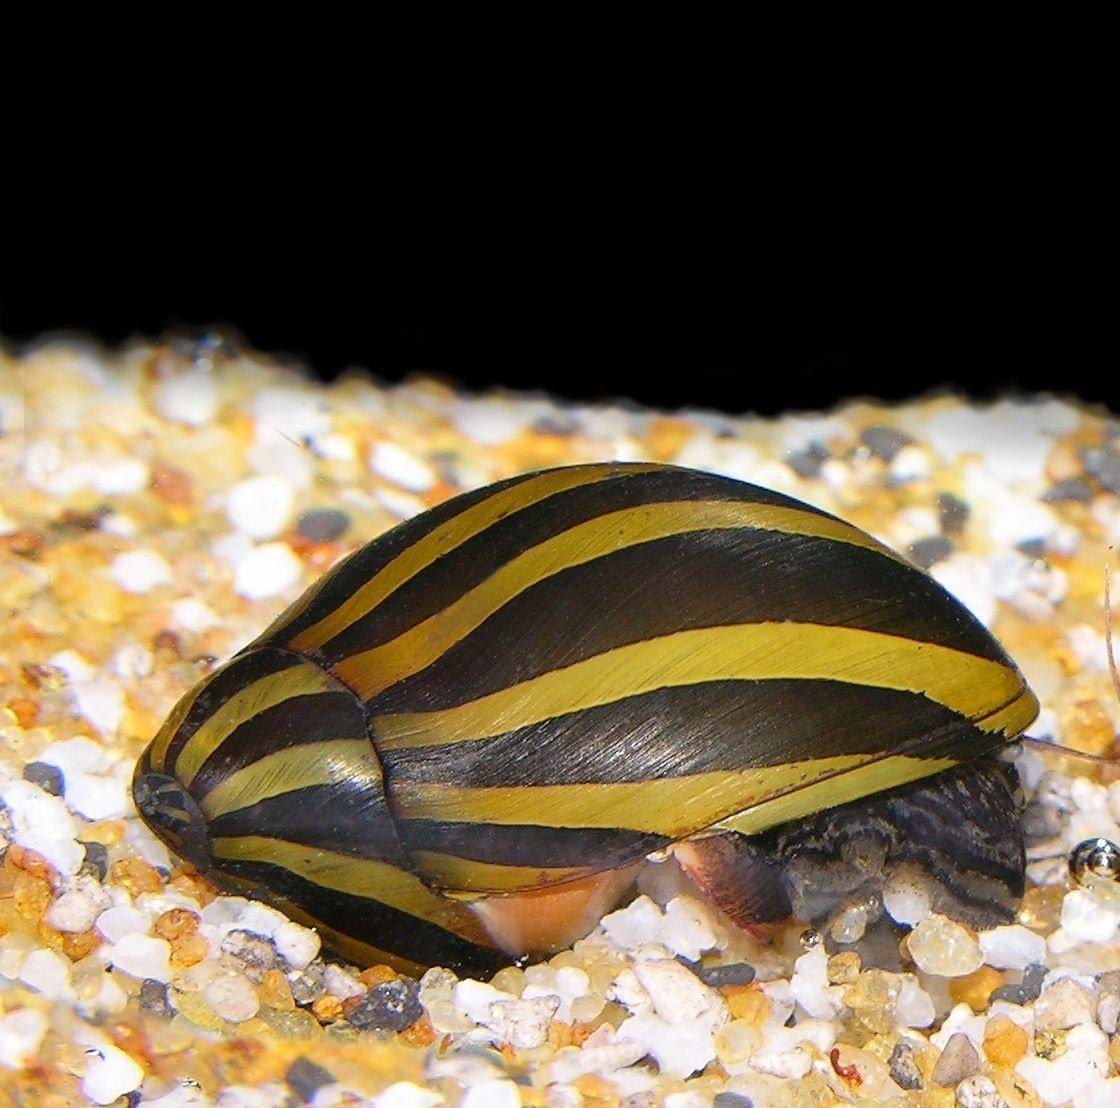 Live Freshwater Aquarium Fish - (12) Zebra Nerite Snails - 12 Pack of Zebra Nerite Snails - by WorldwideTropicals - Populate Your Fish Tank!